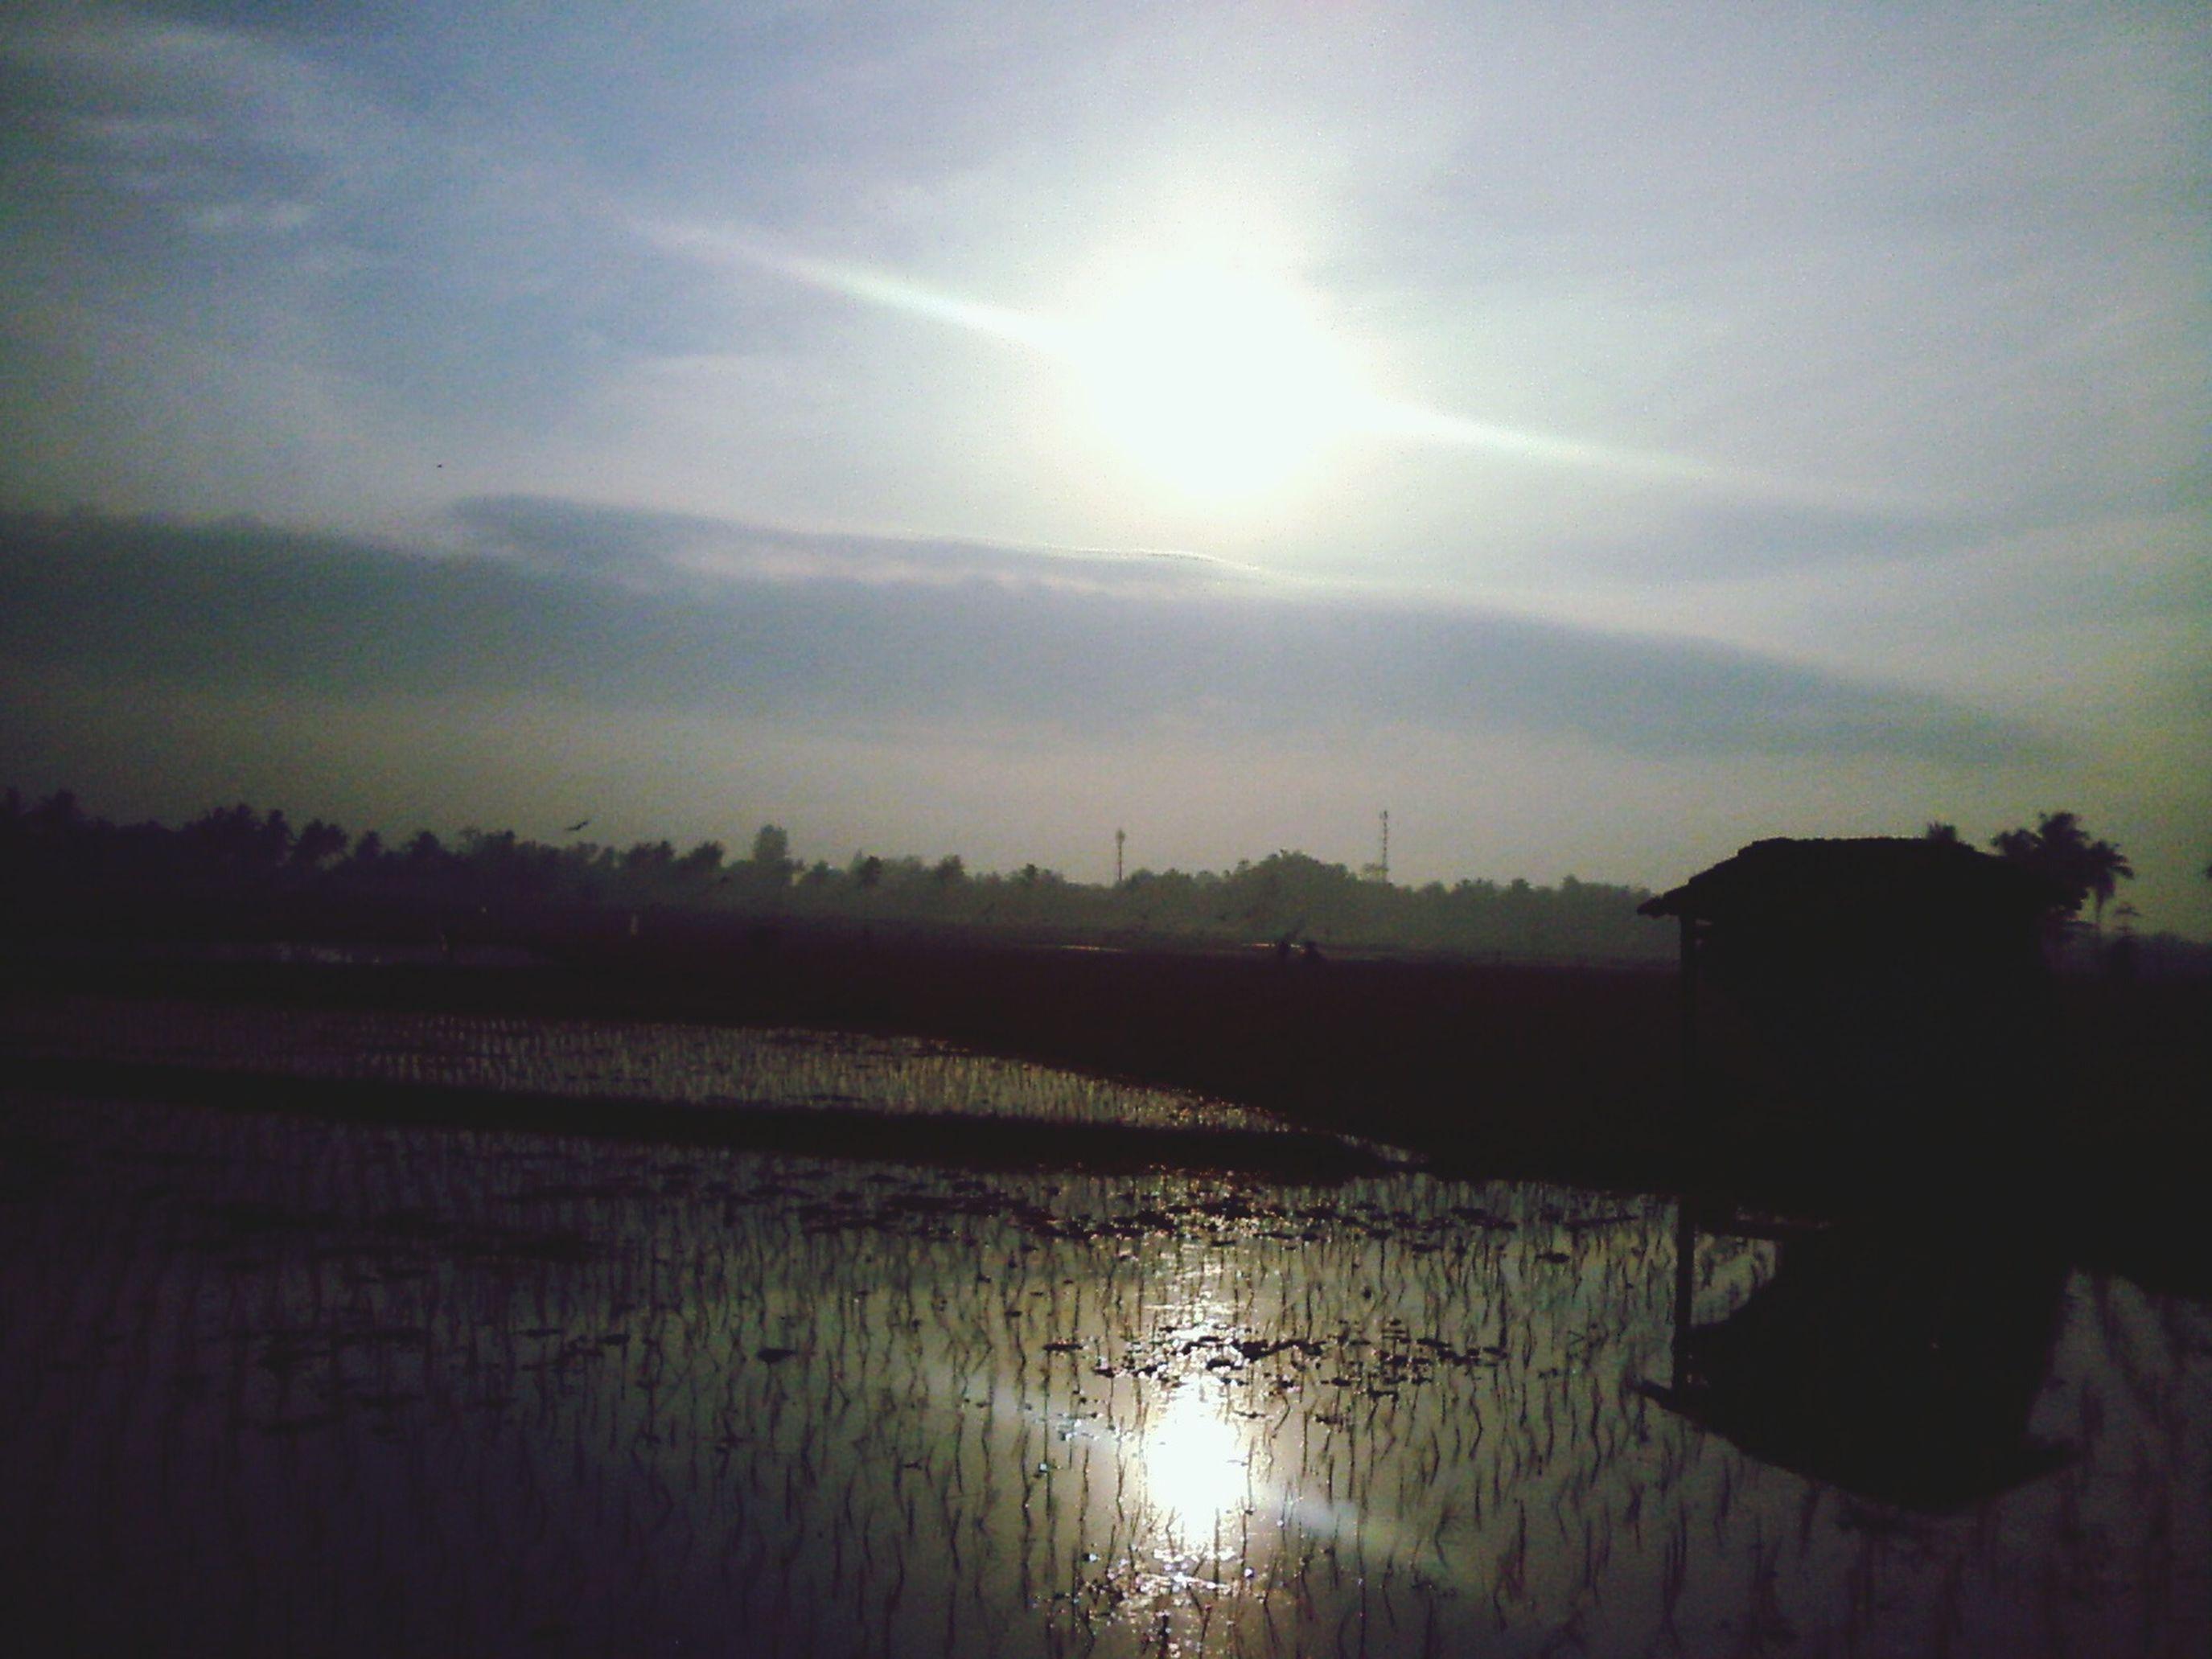 Masih mengenai senja Relaxing Enjoying Life Hello World Shilluote Sunset_collection Photo